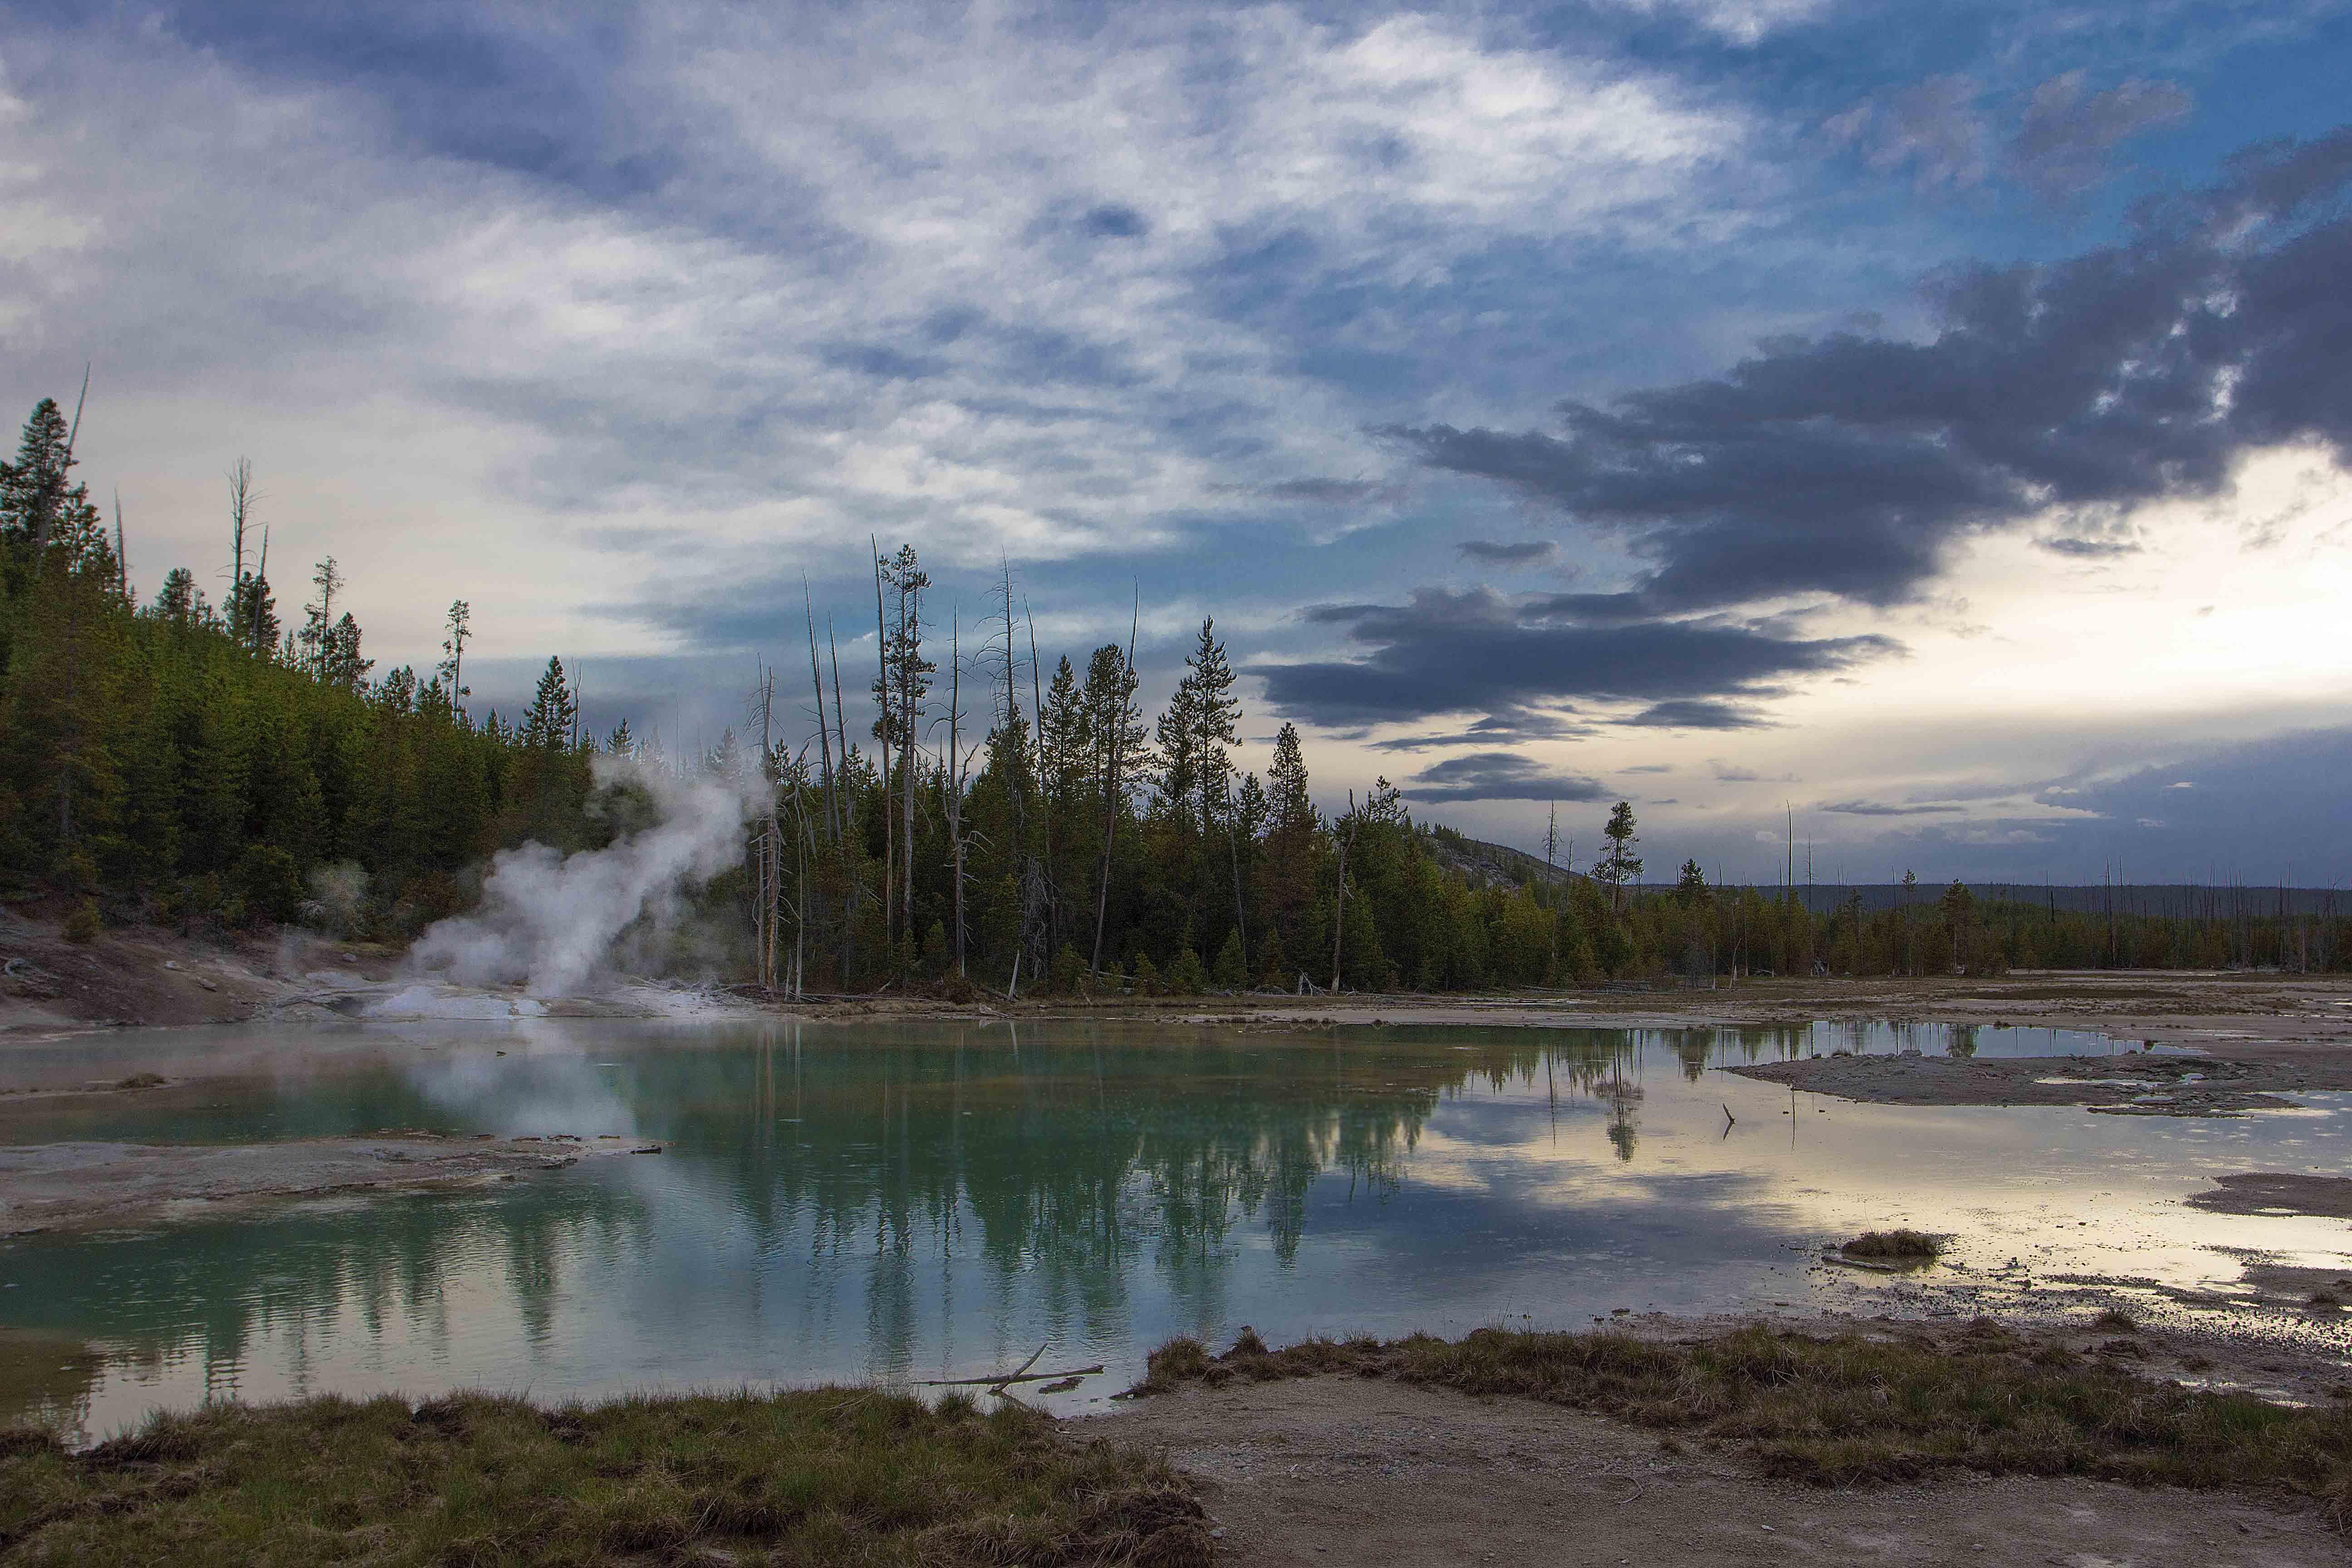 hot springs, norris area, porcelain pool, steam, yellowstone, Екатерина Богданова